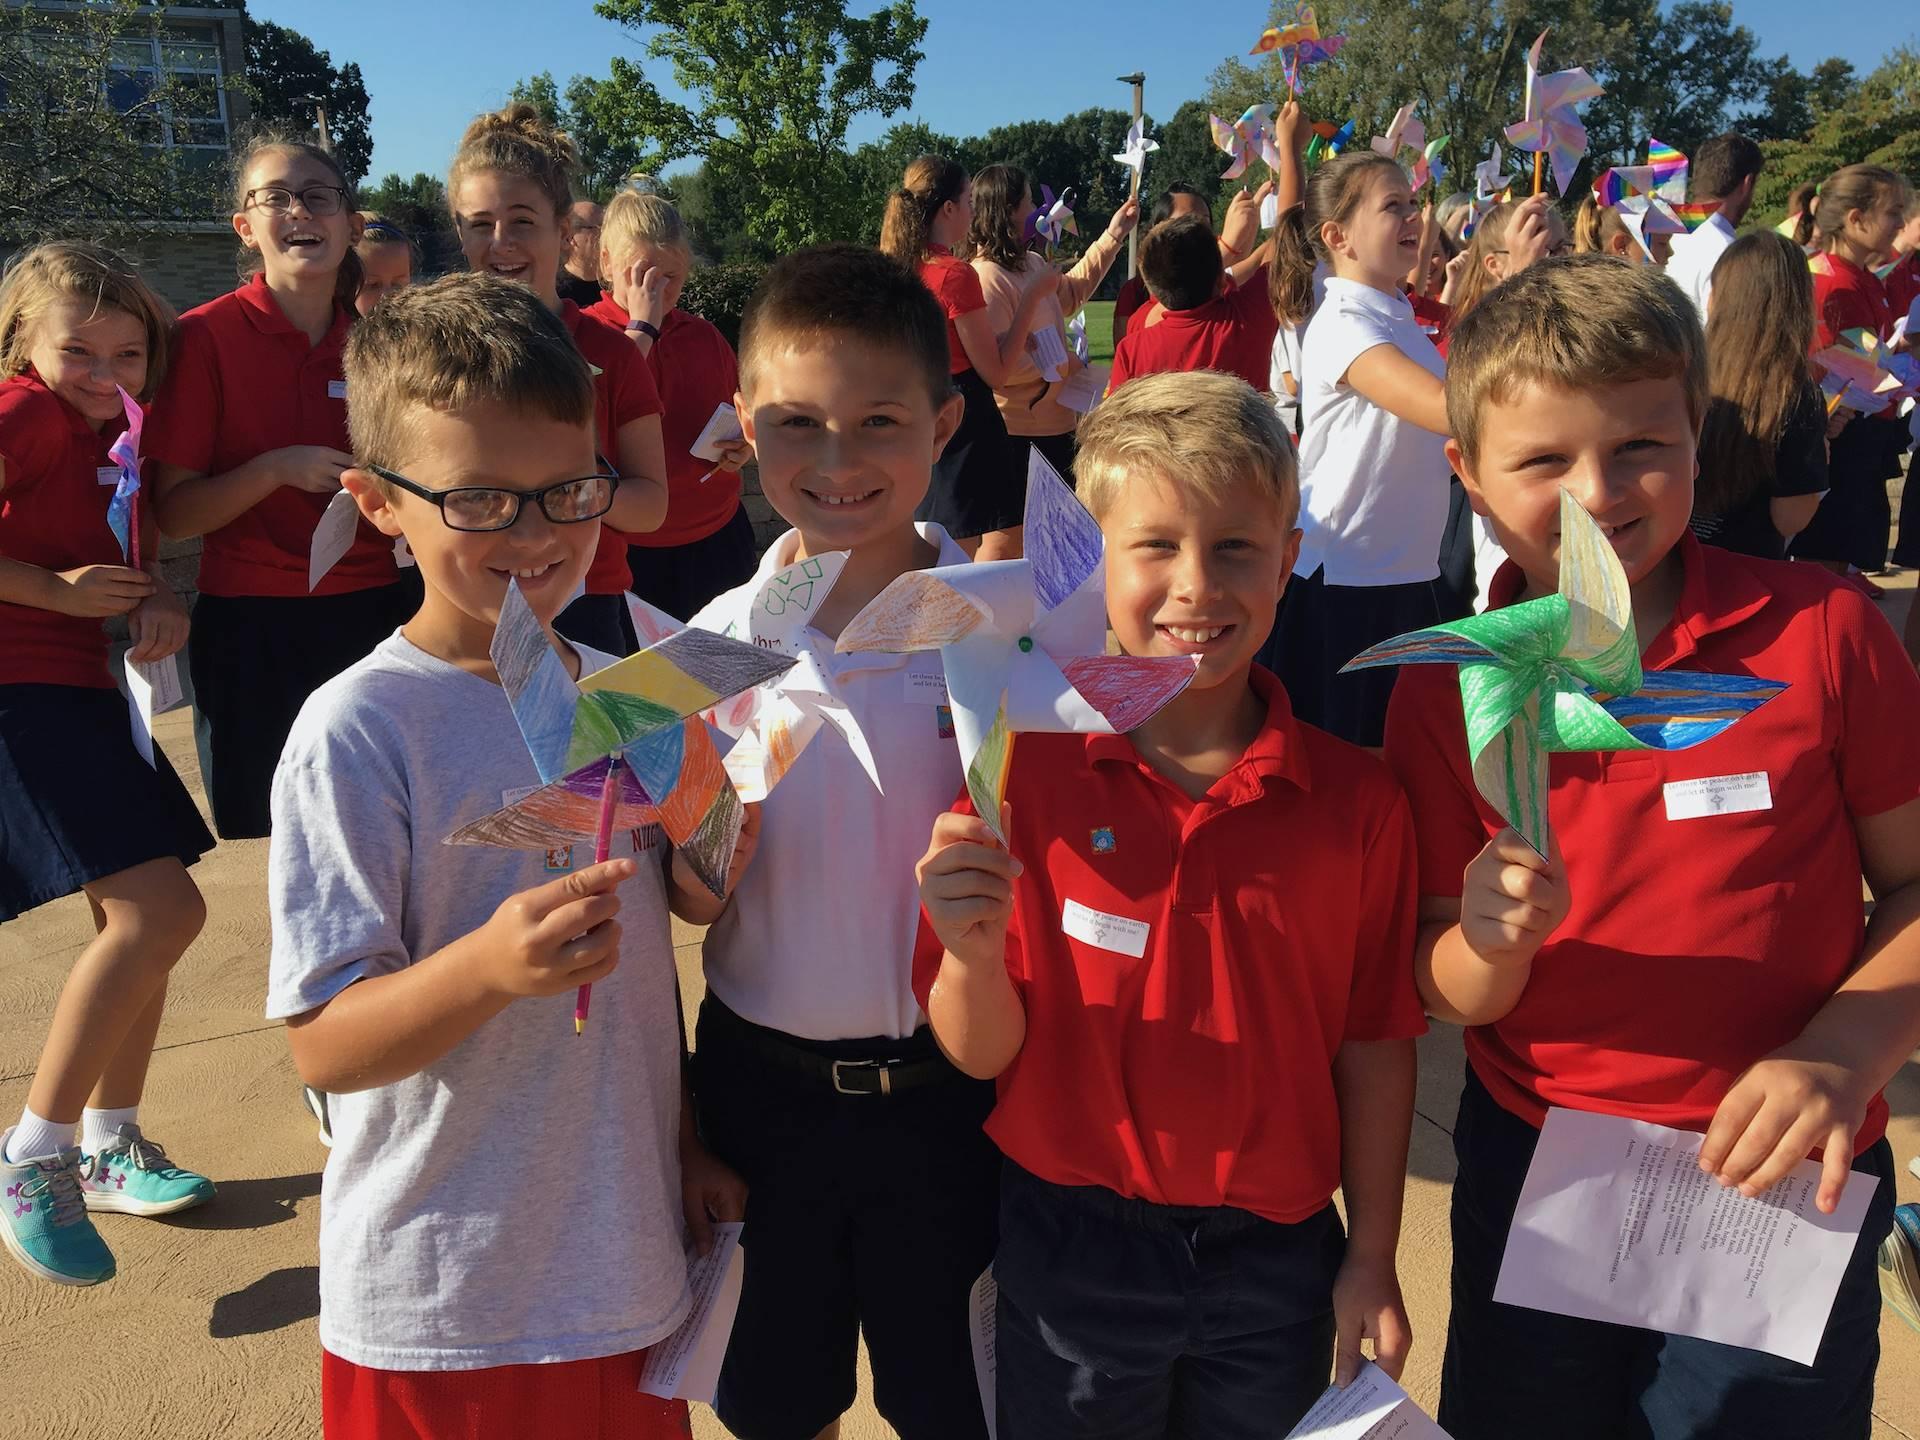 boys show their pinwheels for peace